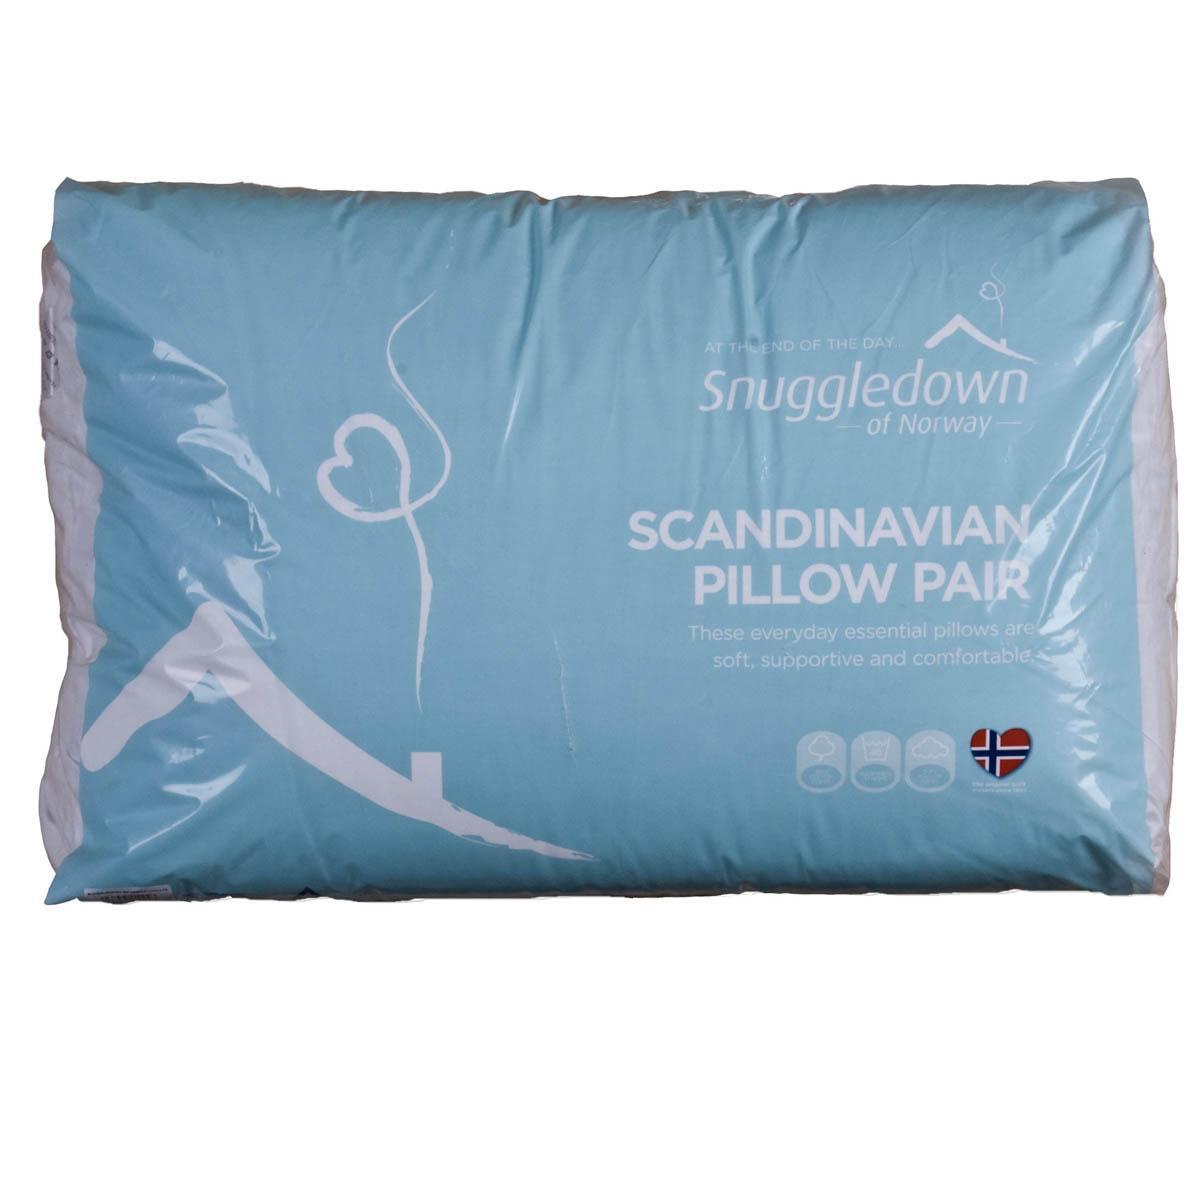 Snuggledown Scandinavian Pillow : White Snuggledown Scandinavian Pillow Pair